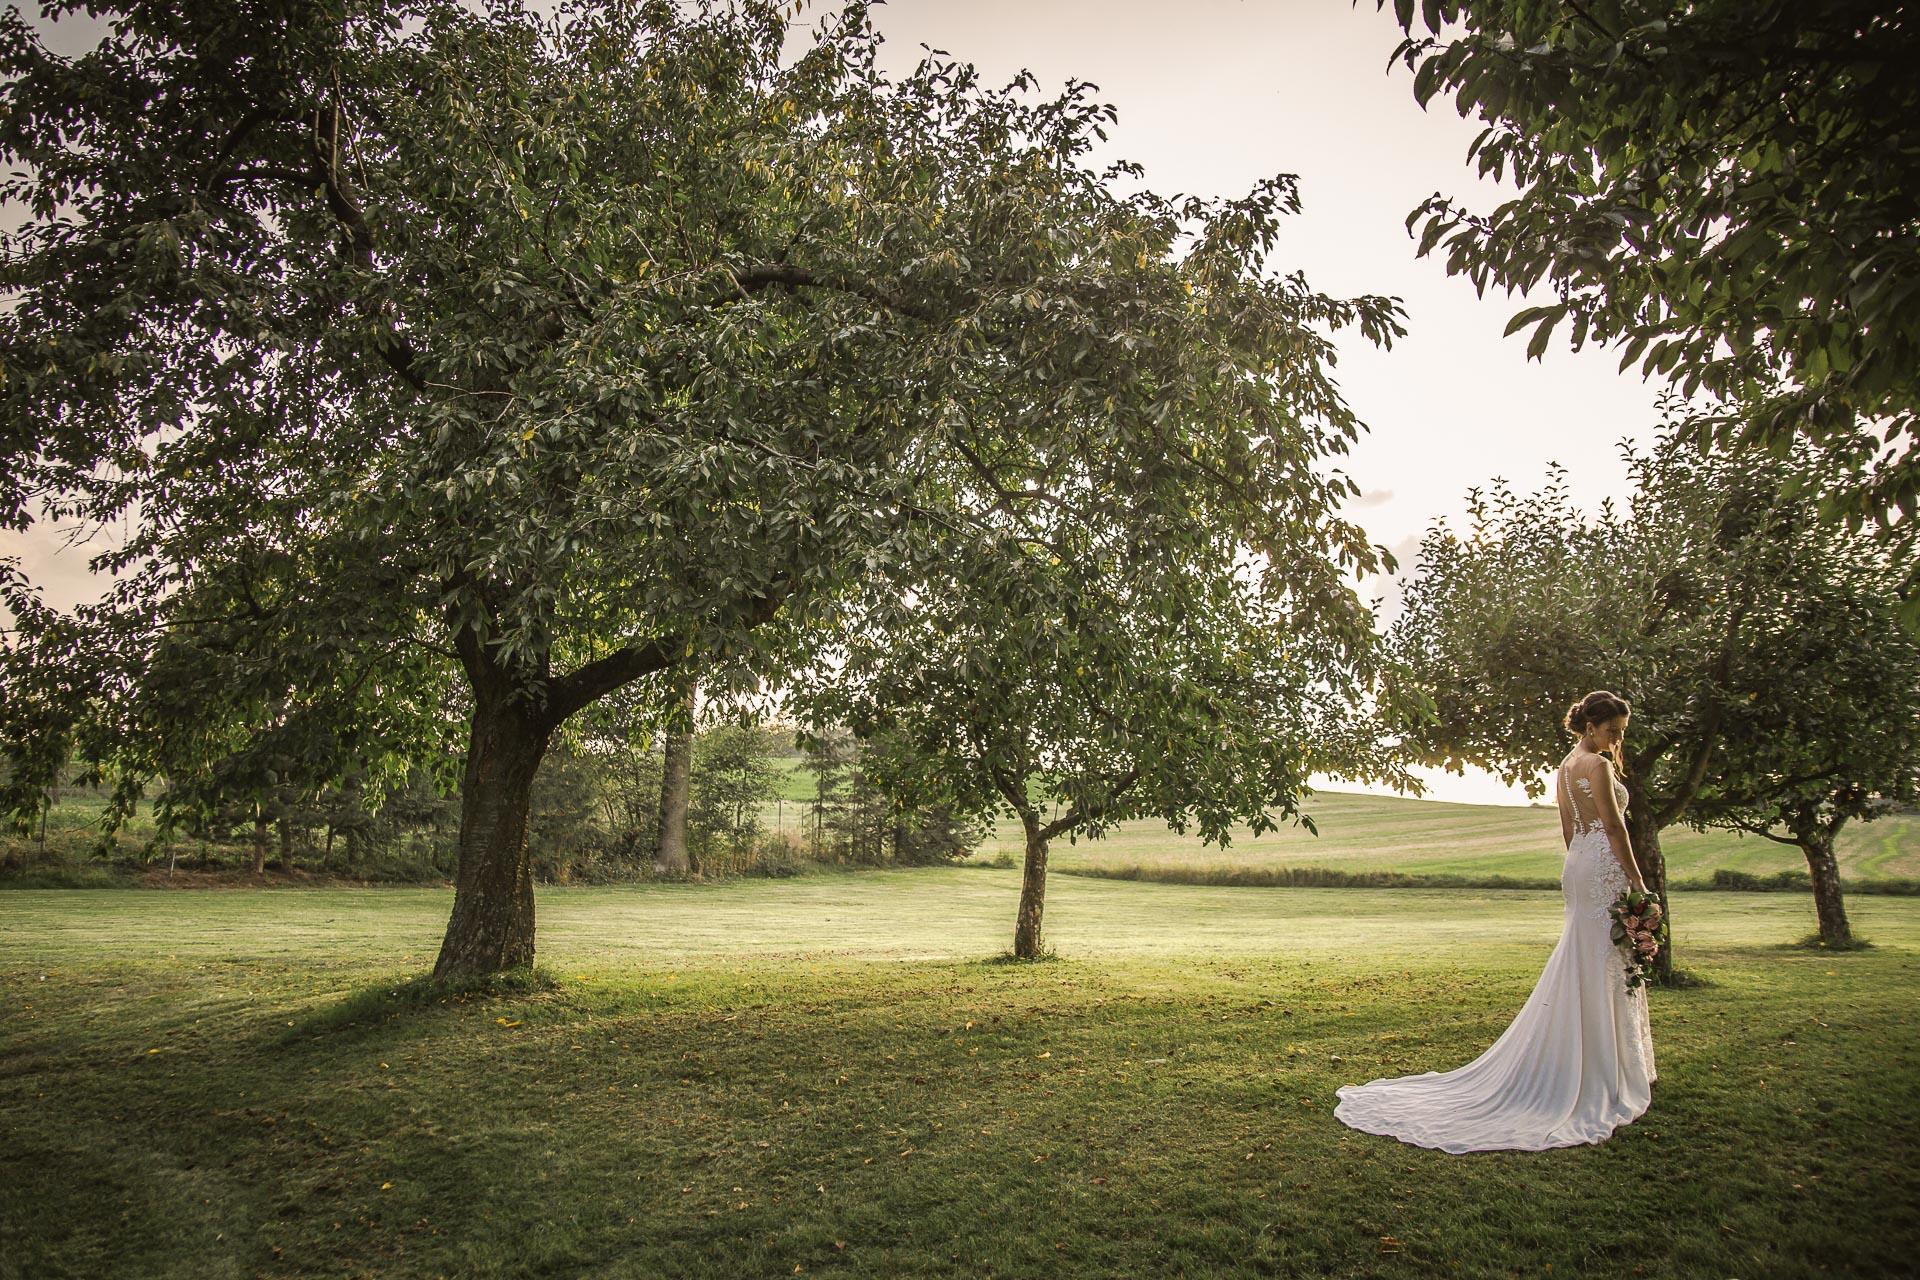 svatební-fotograf-wedding-svatebni-video-orlík-vltava-kostel-statek-stodola-boho-svatba-Beautyfoto-539